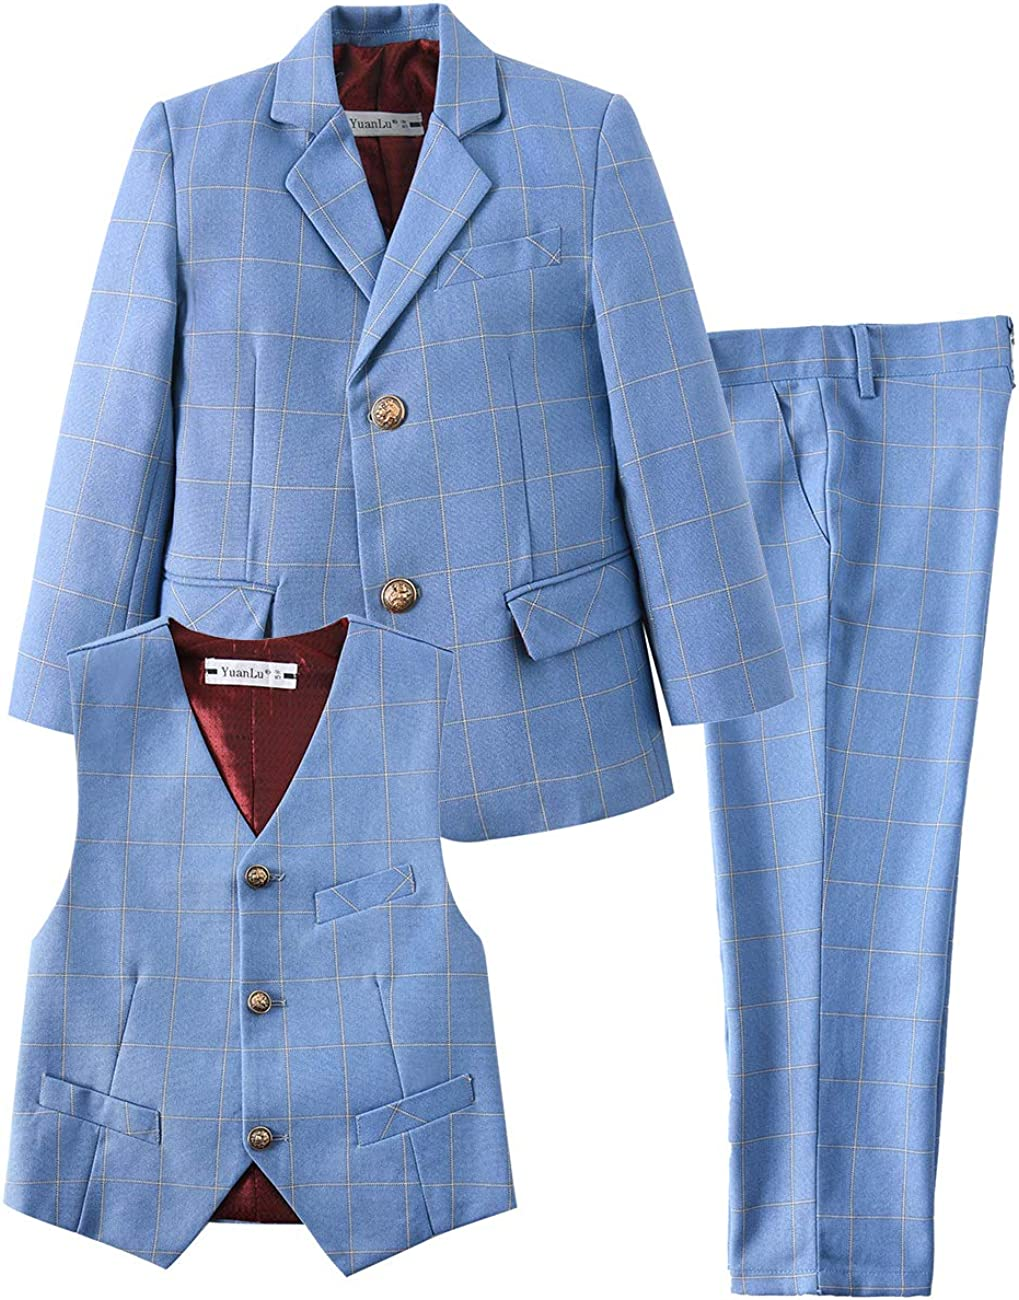 YuanLu 3 信託 Piece Kids Boys' Formal Dress Blazer Vest Pants Sui 出群 and